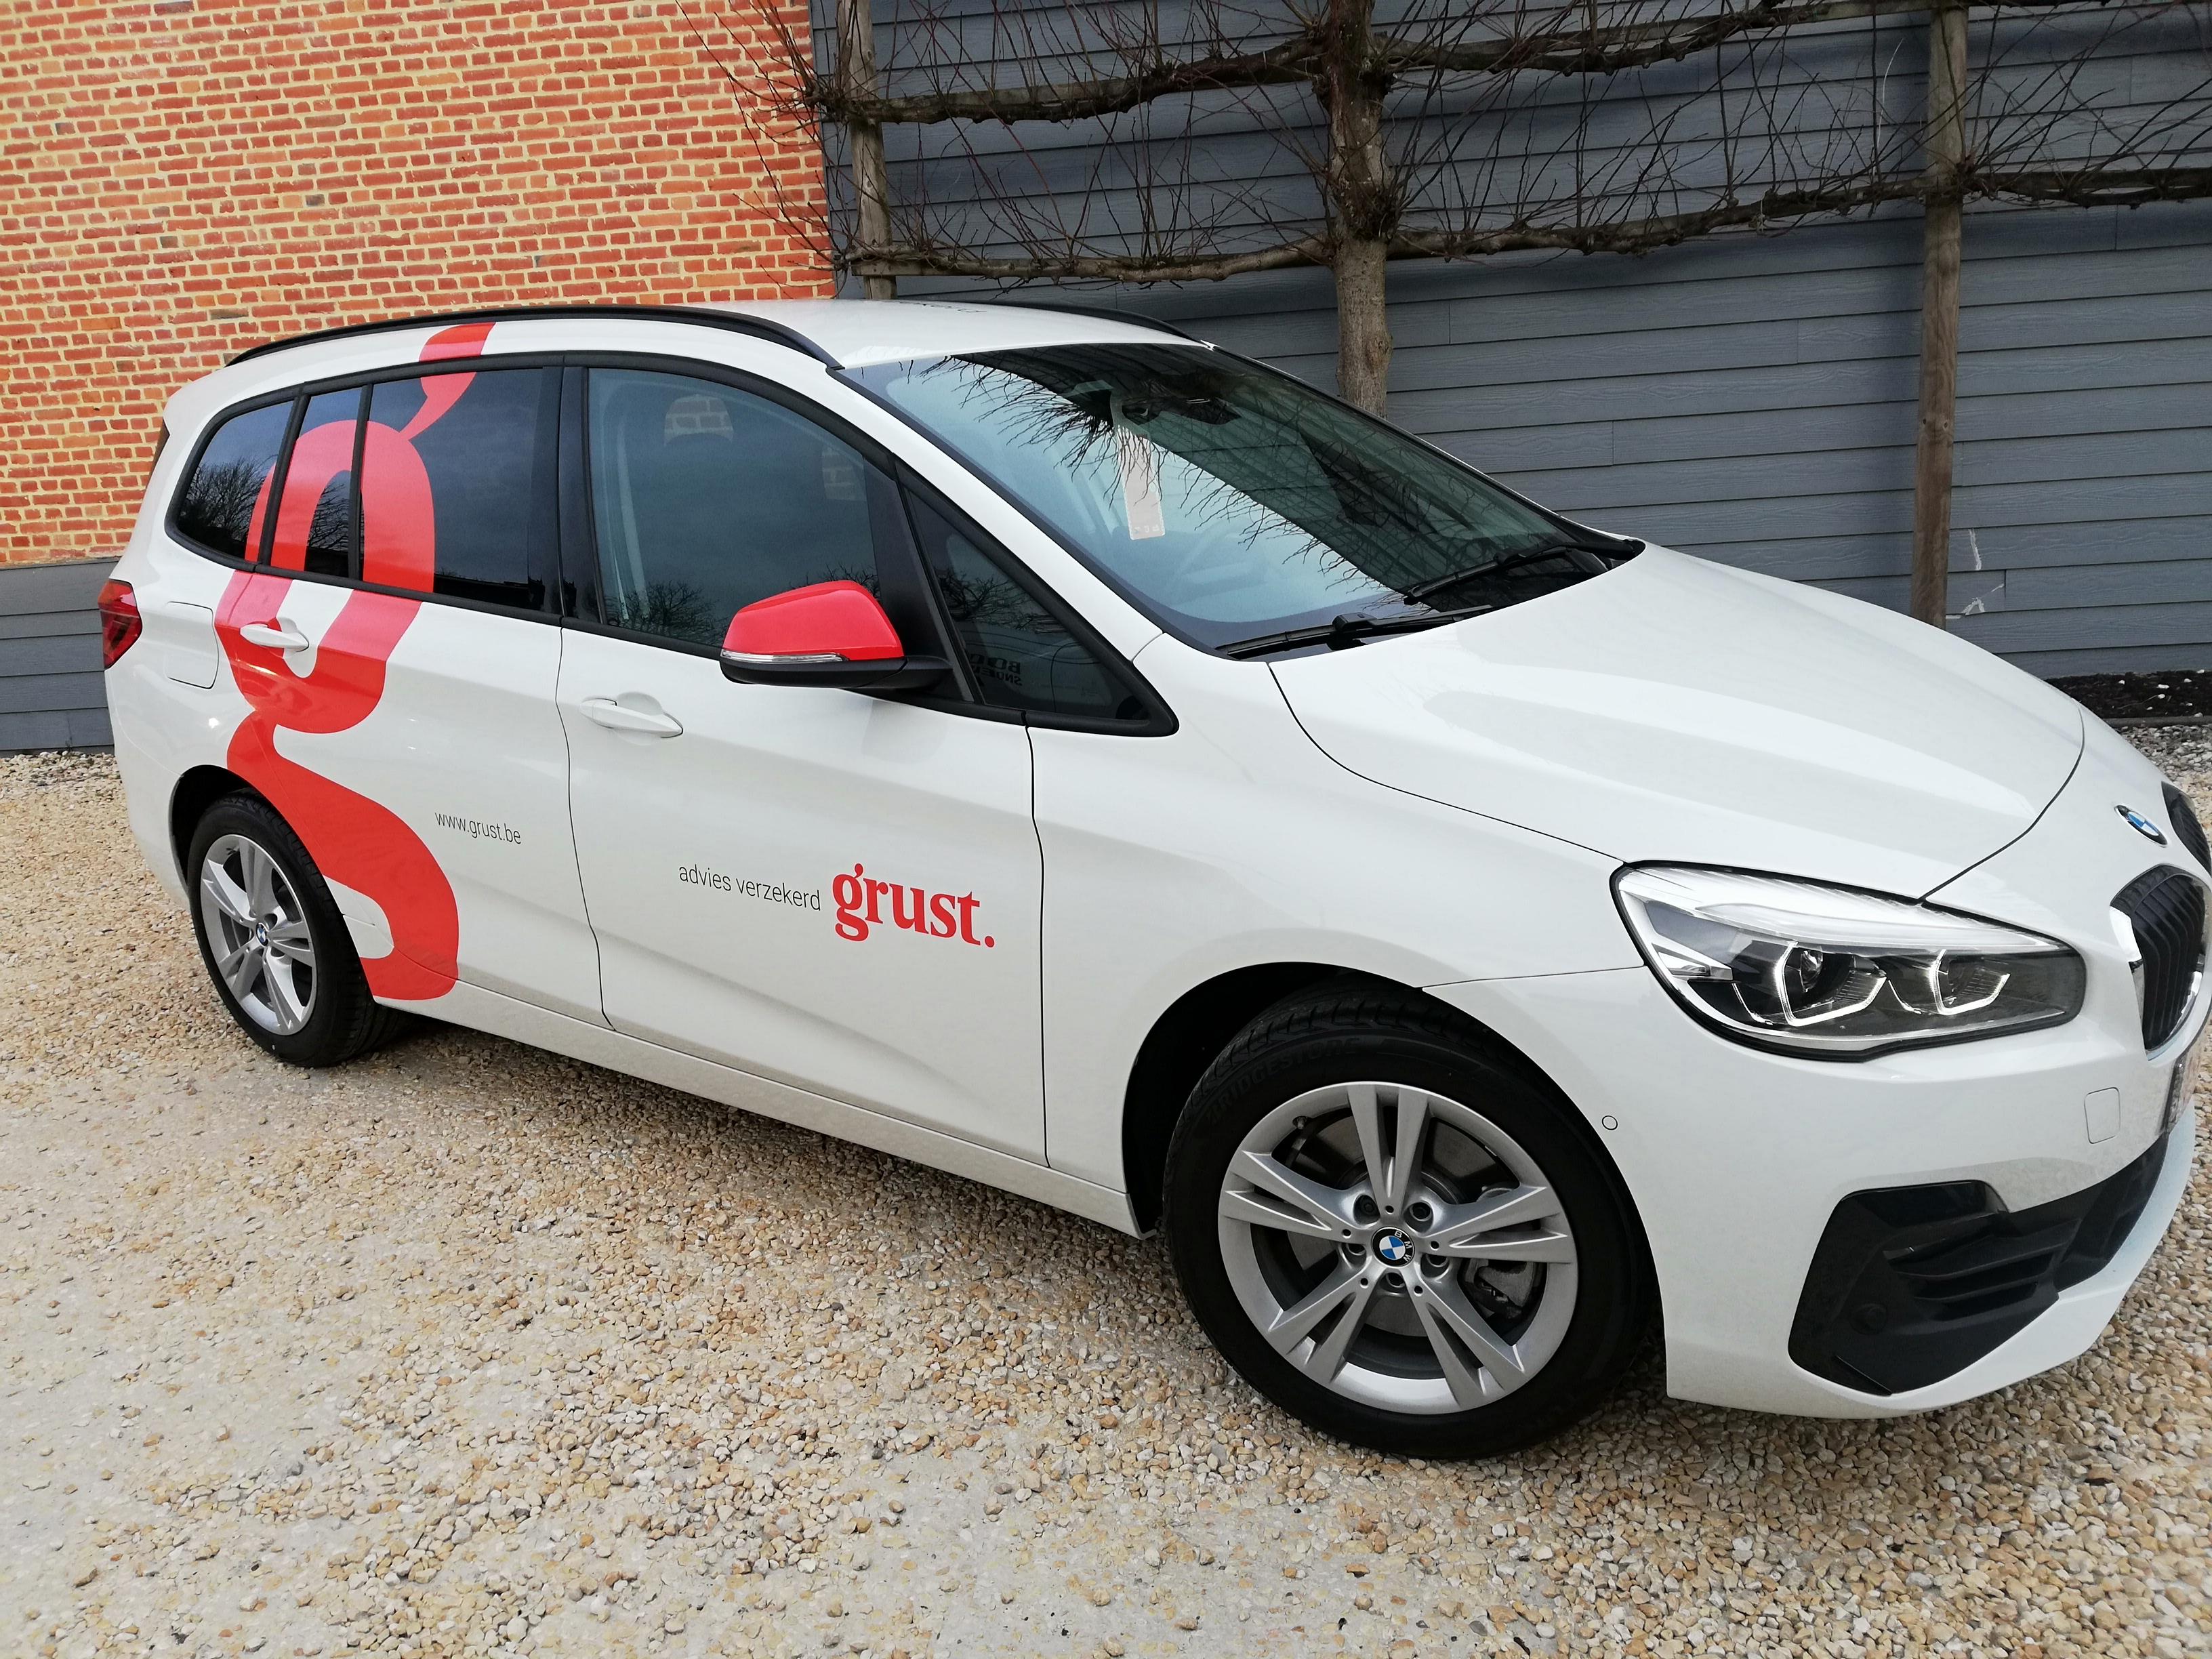 XL Reklame Mechelen - autobelettering Grust